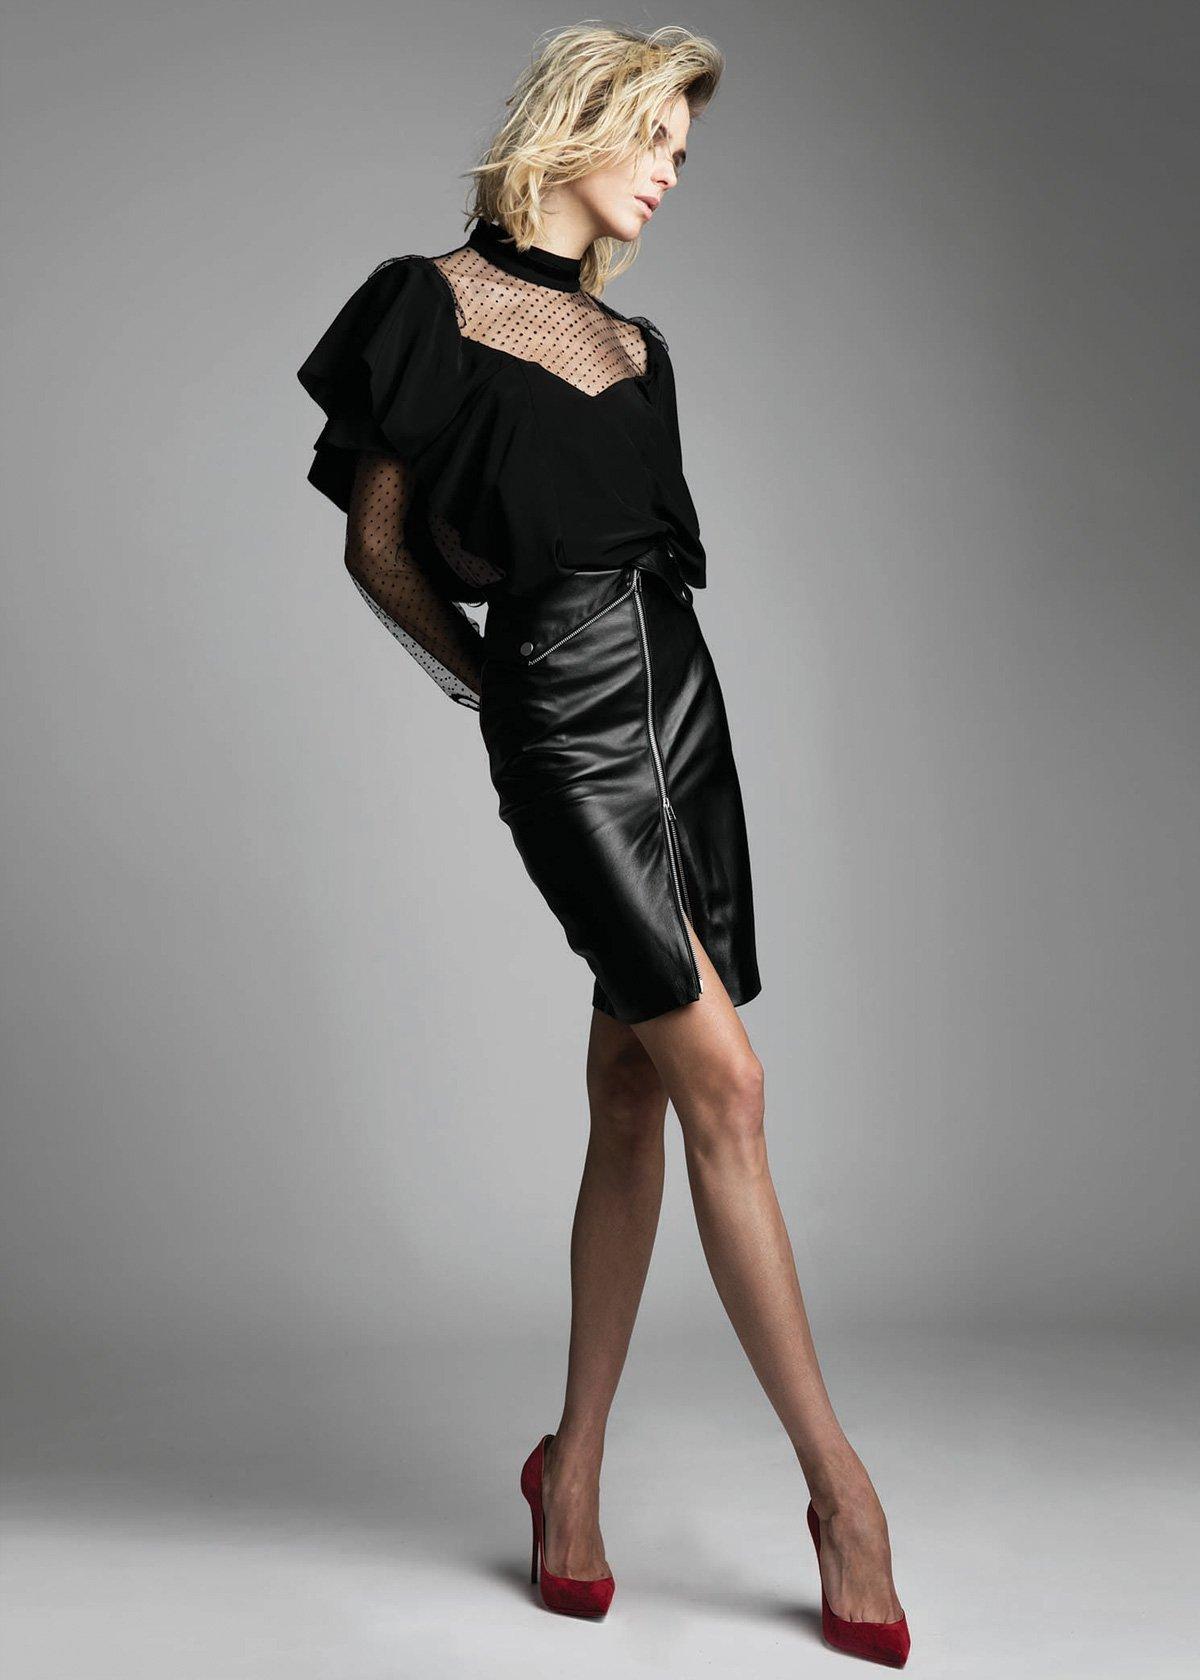 newton-mesh-ruffle-blouse_1200x.progressive.jpg